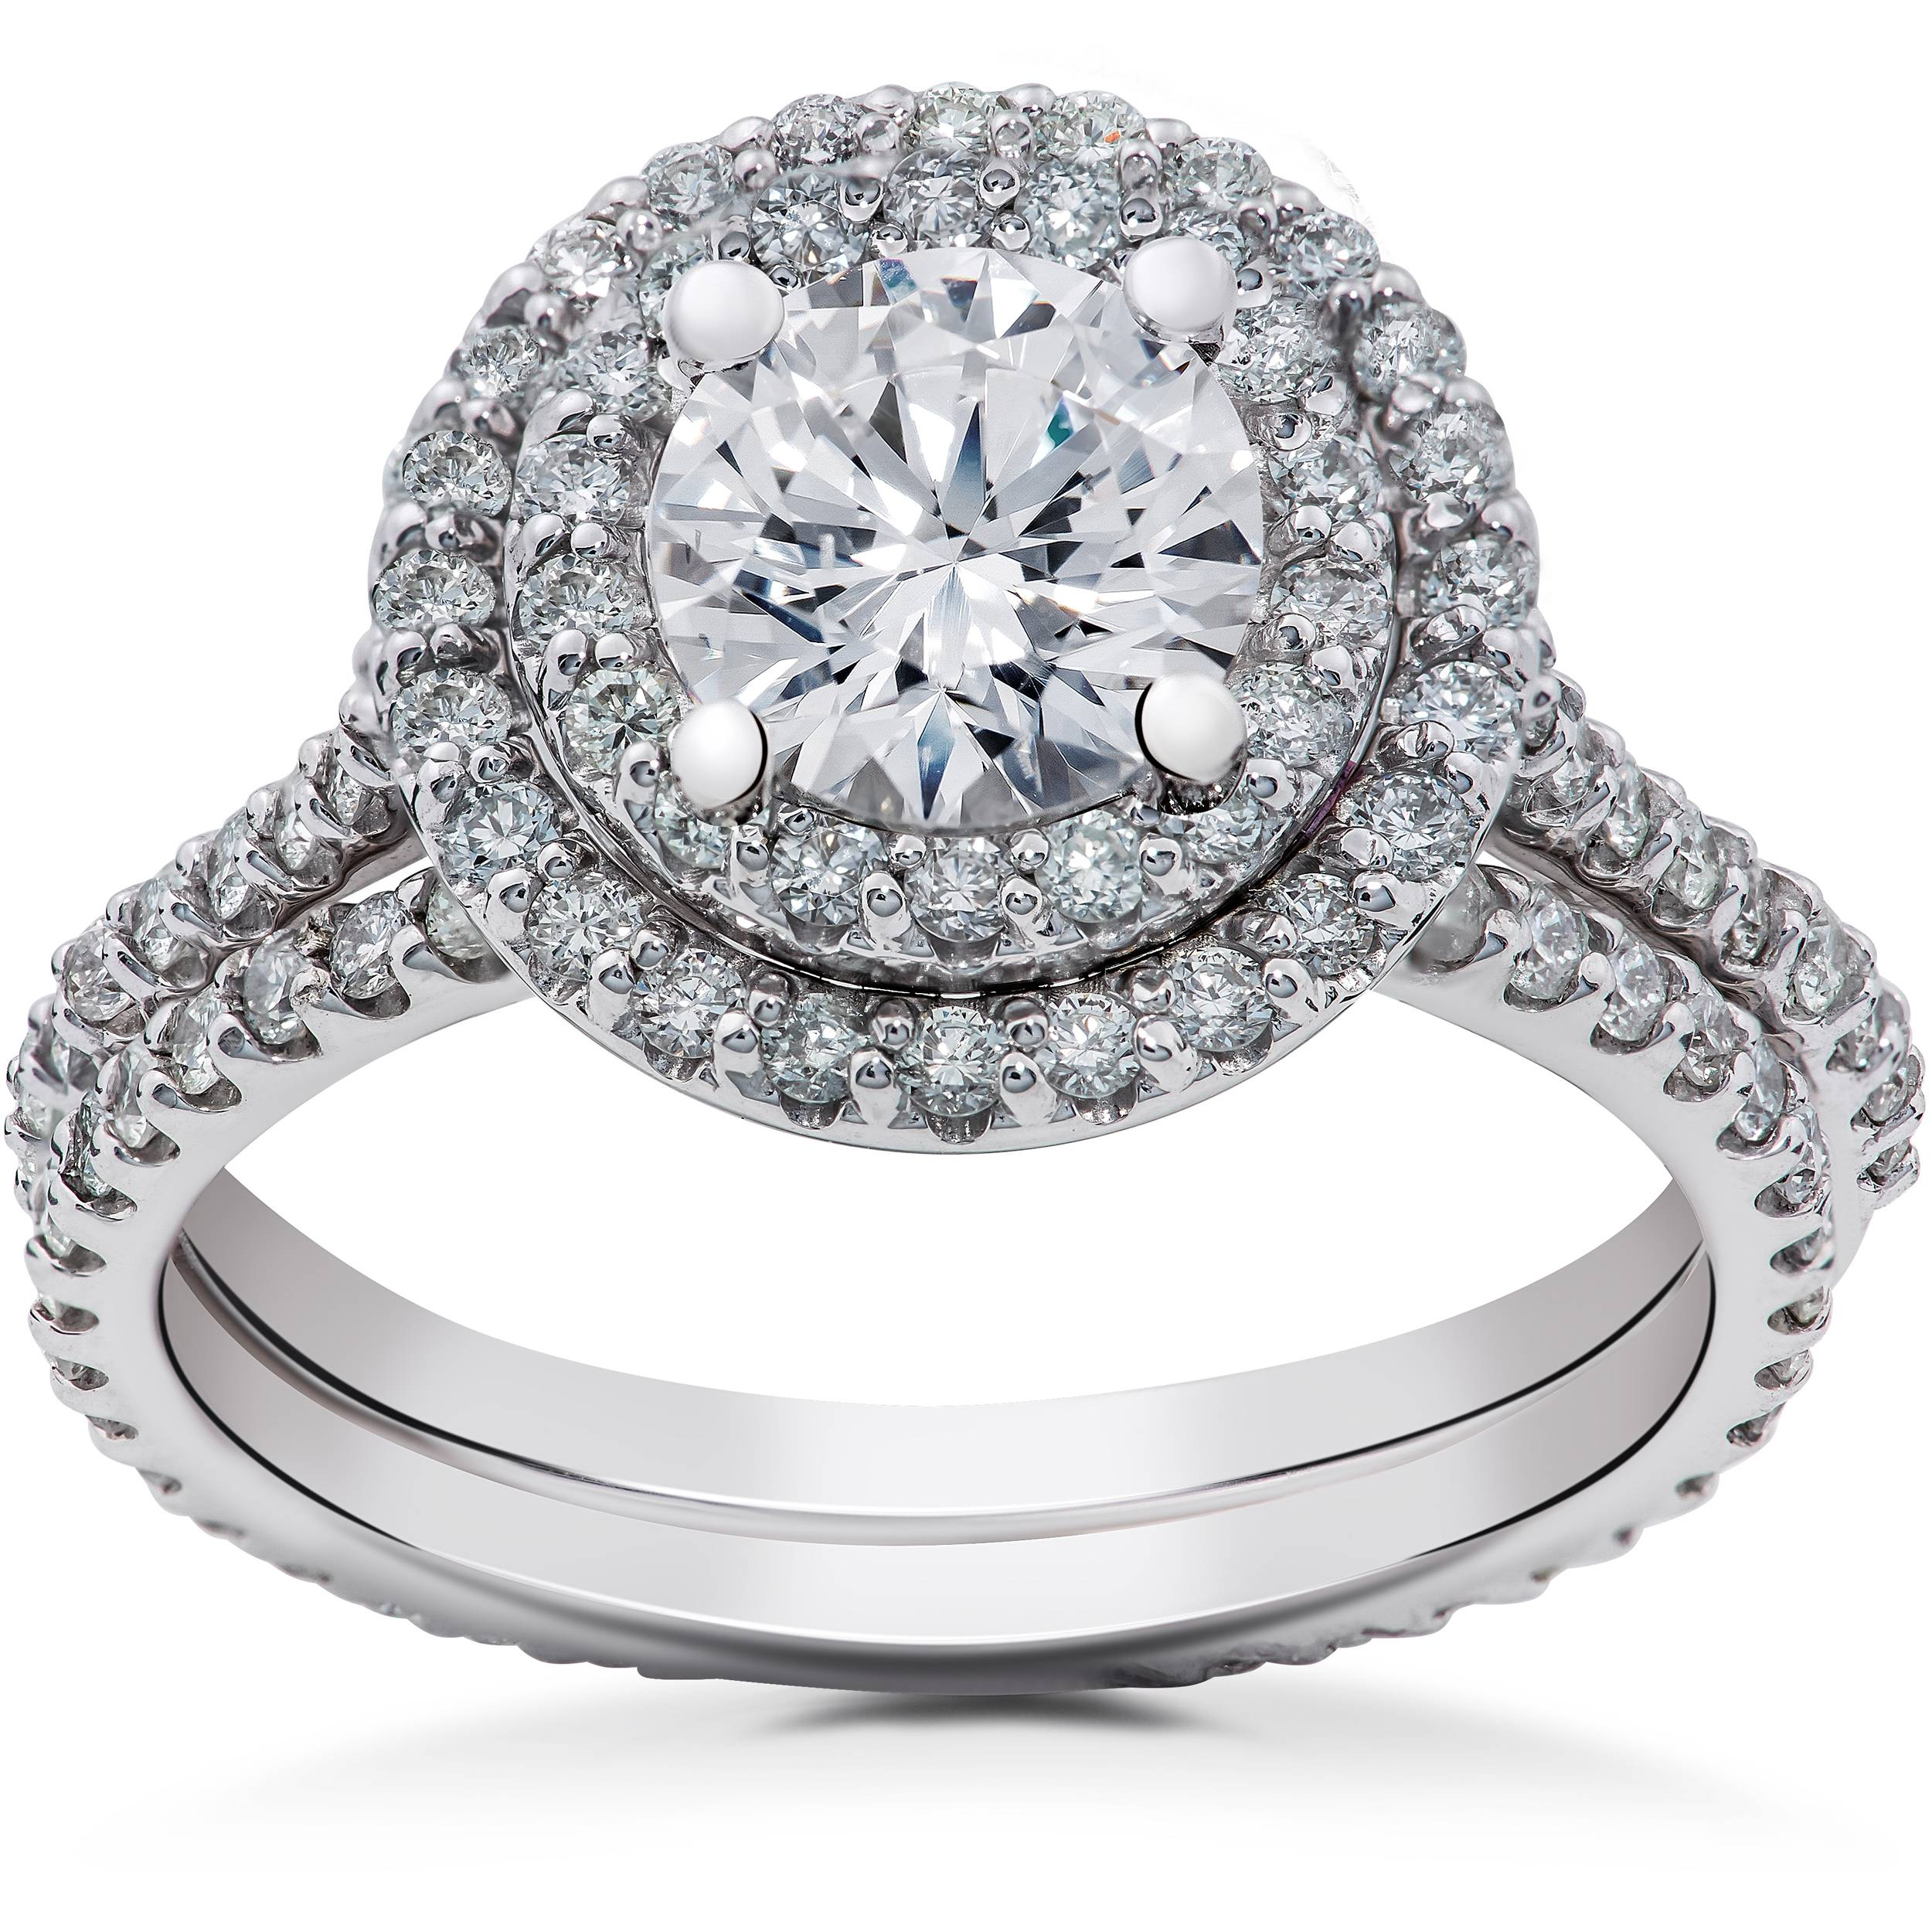 2 ct Round Halo Diamond Engagement Ring Setting & Matching ...